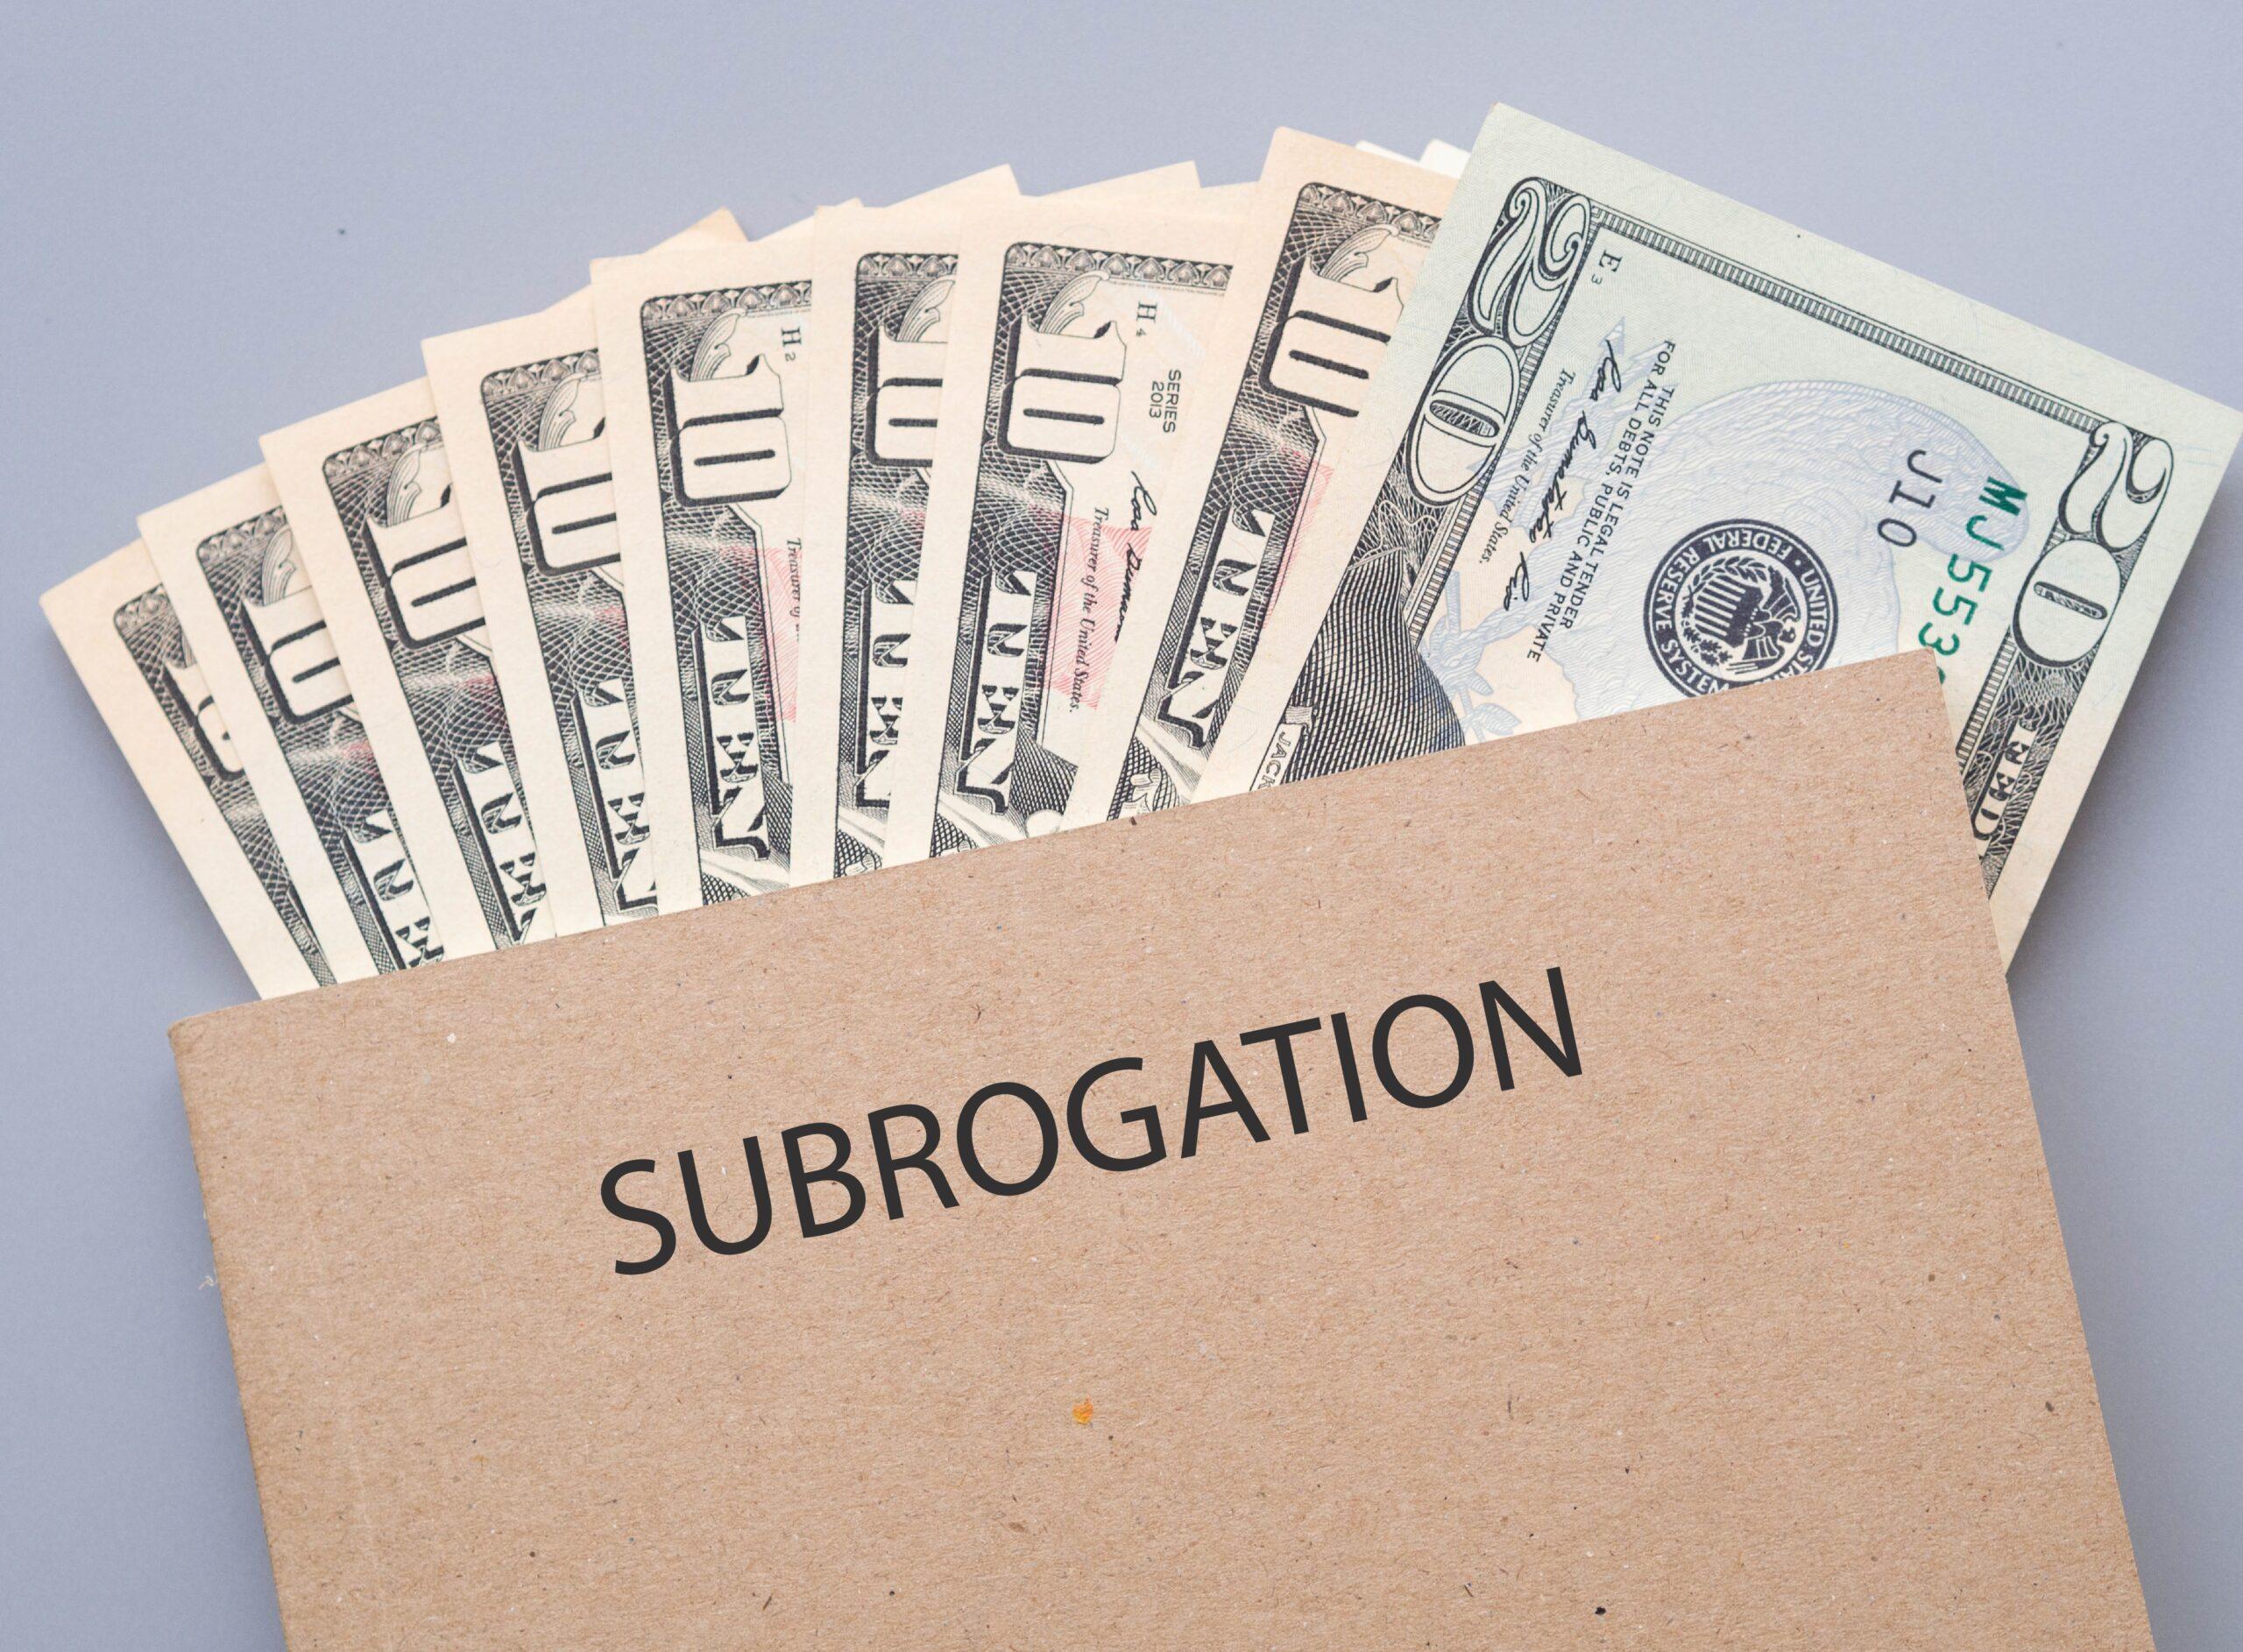 Cash in Tan Folder Labeled Subrogation